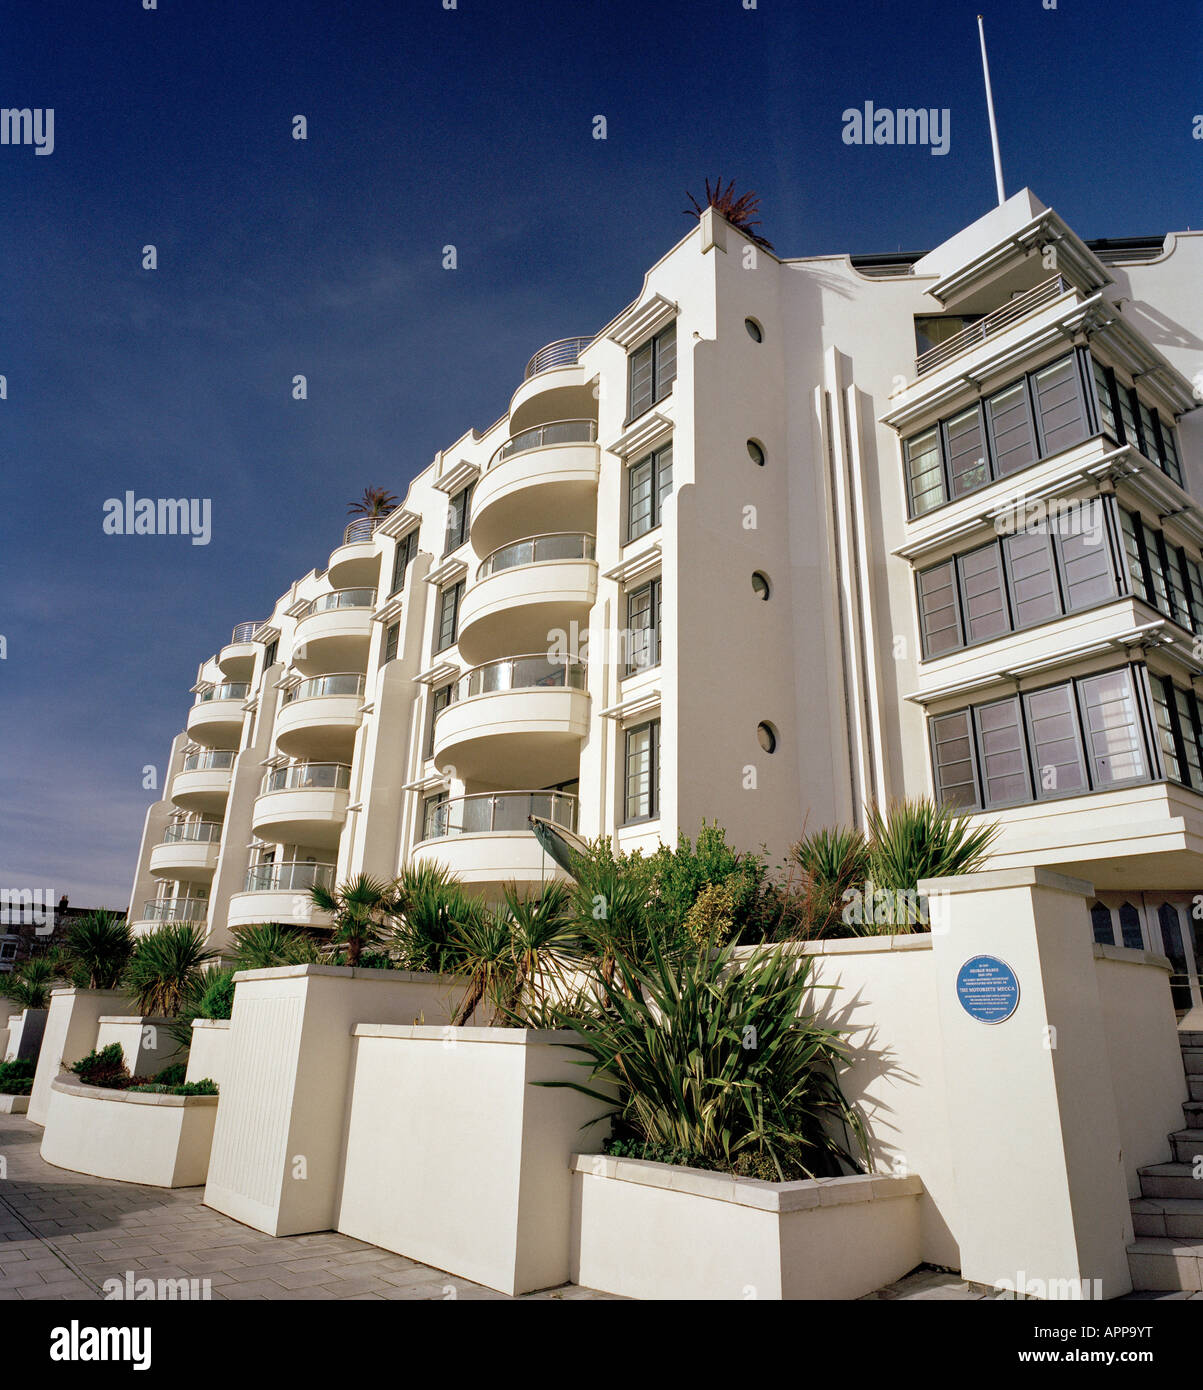 Blue Isle Apartments: New Warnes Apartments Marine Parade York Road Worthing